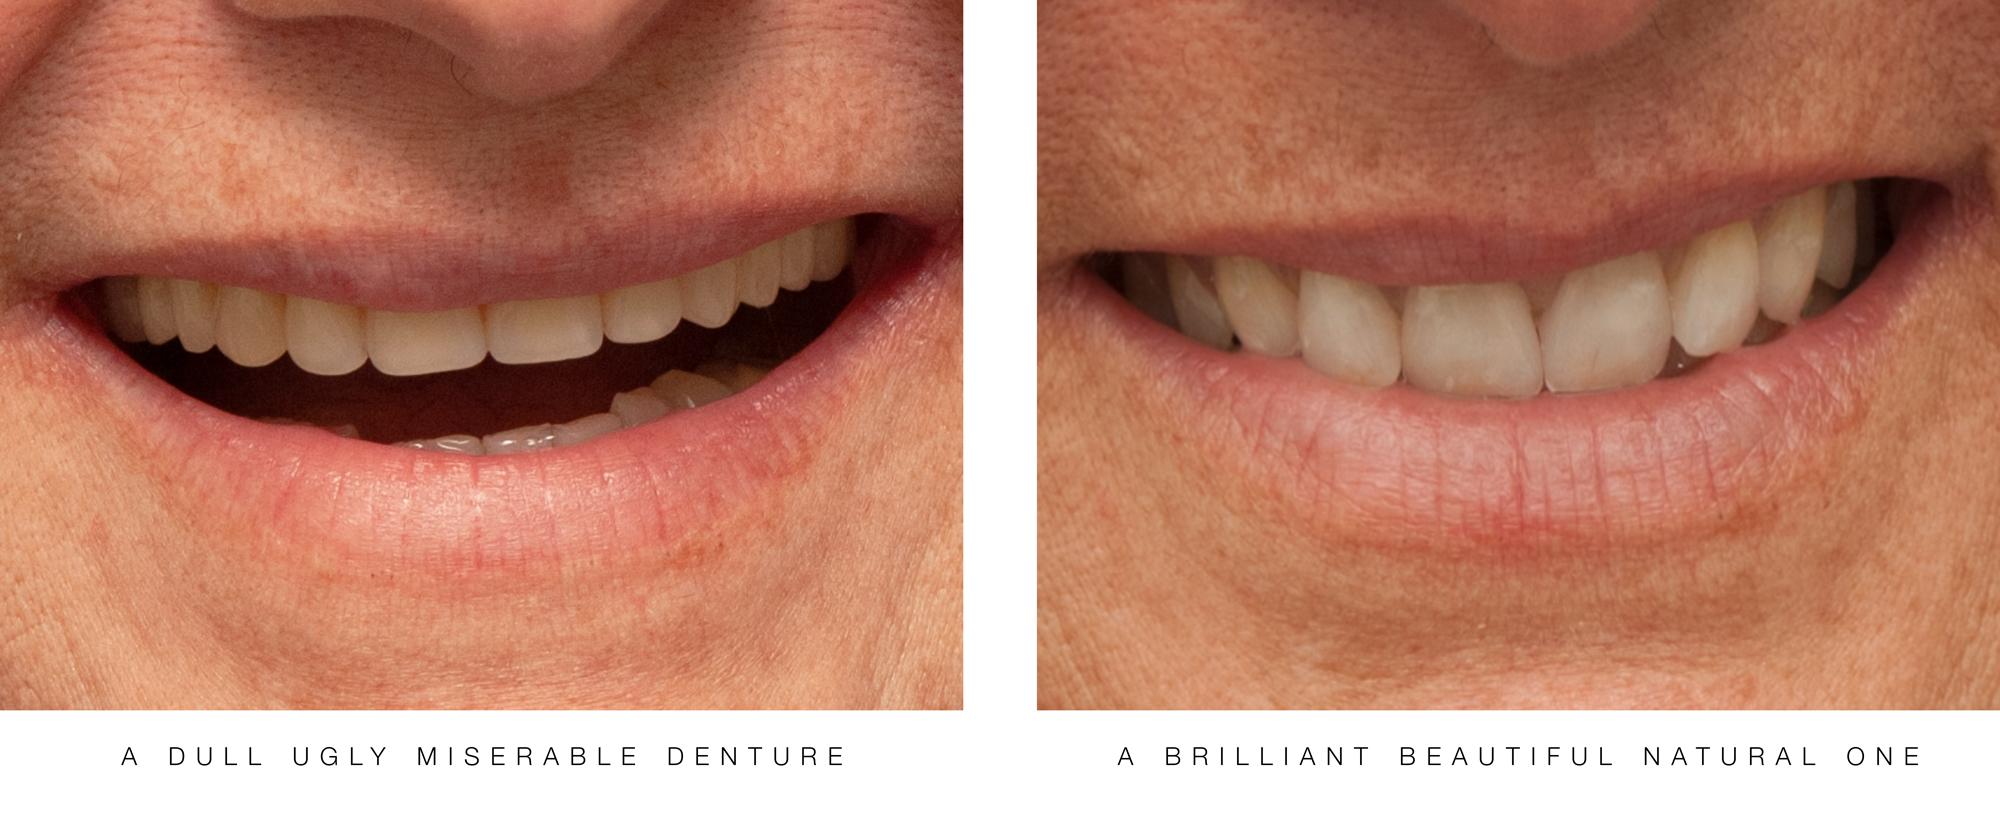 Fabulous Teeth :: 5 Dentures